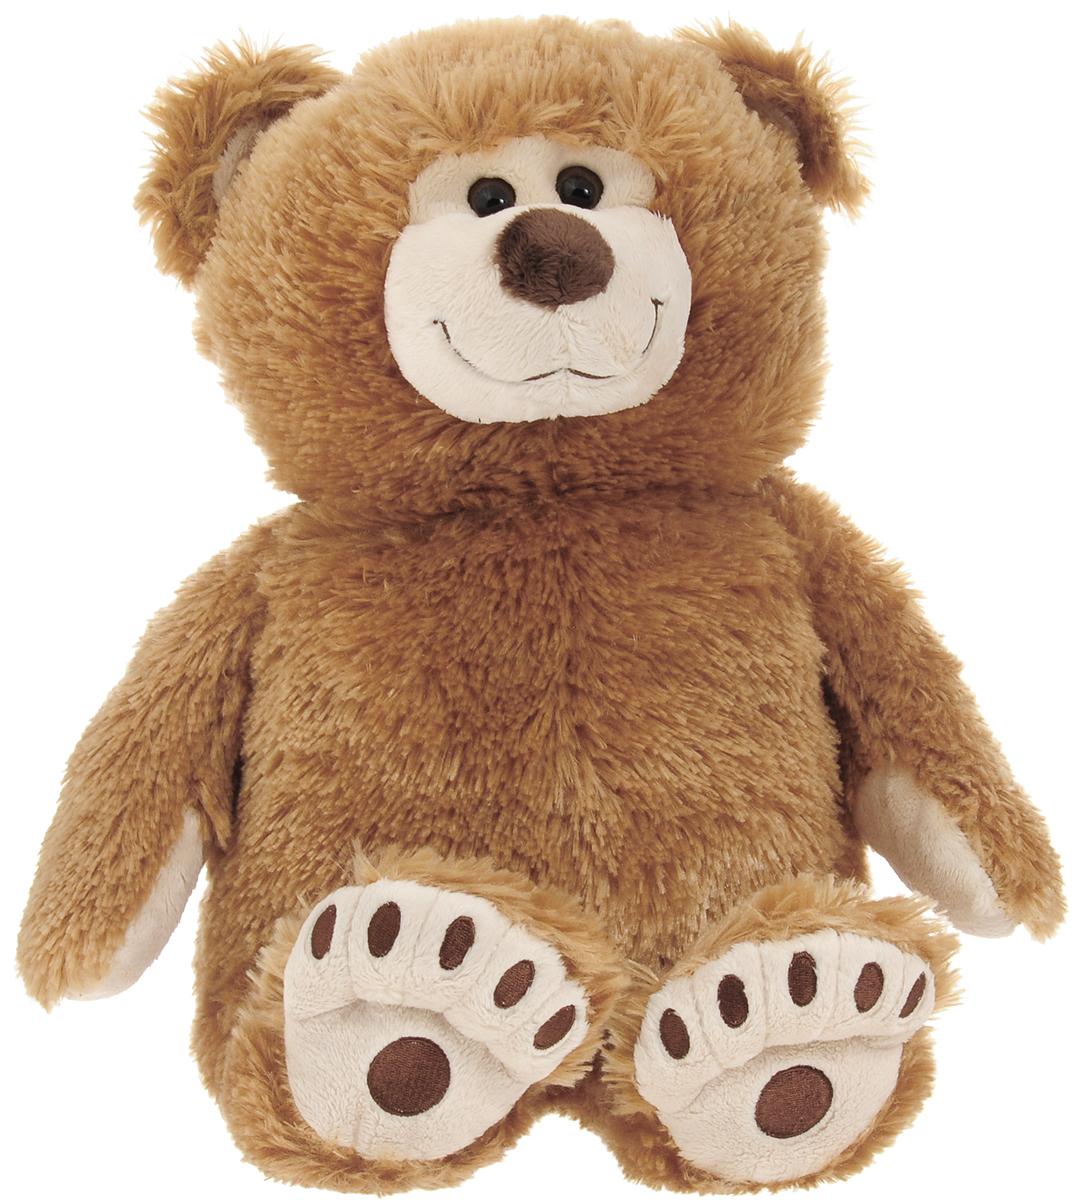 Plush Apple Мягкая игрушка Медведь Аркаша 45 см цвет коричневый plush apple 27